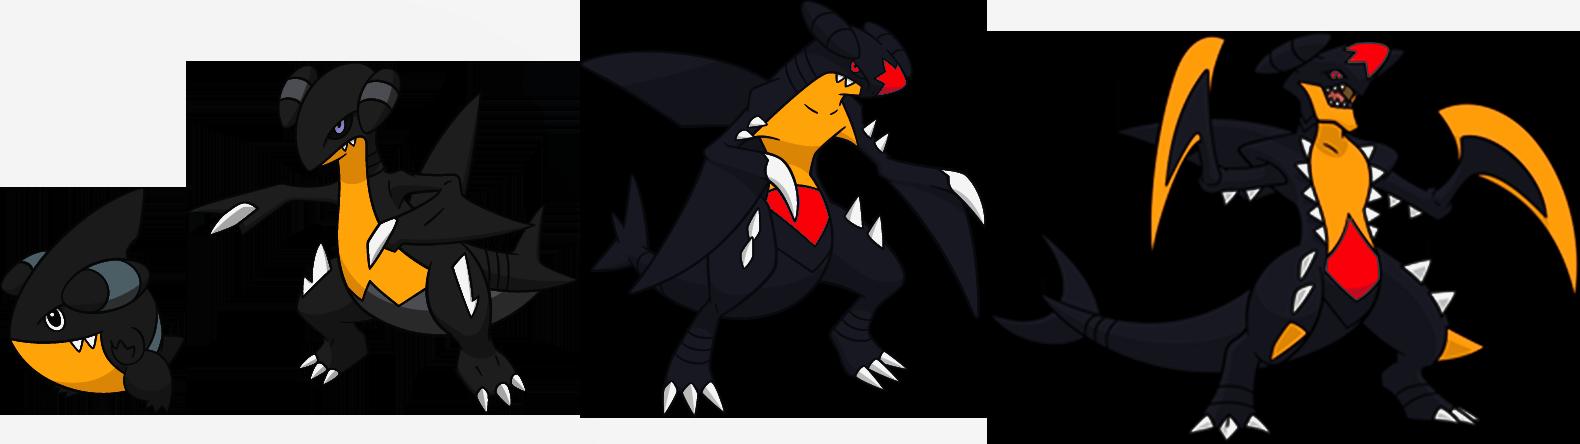 sey sey 12 19 alternate shinies gible gabite mega garchomp by high jump - Pokemon Carchacrok